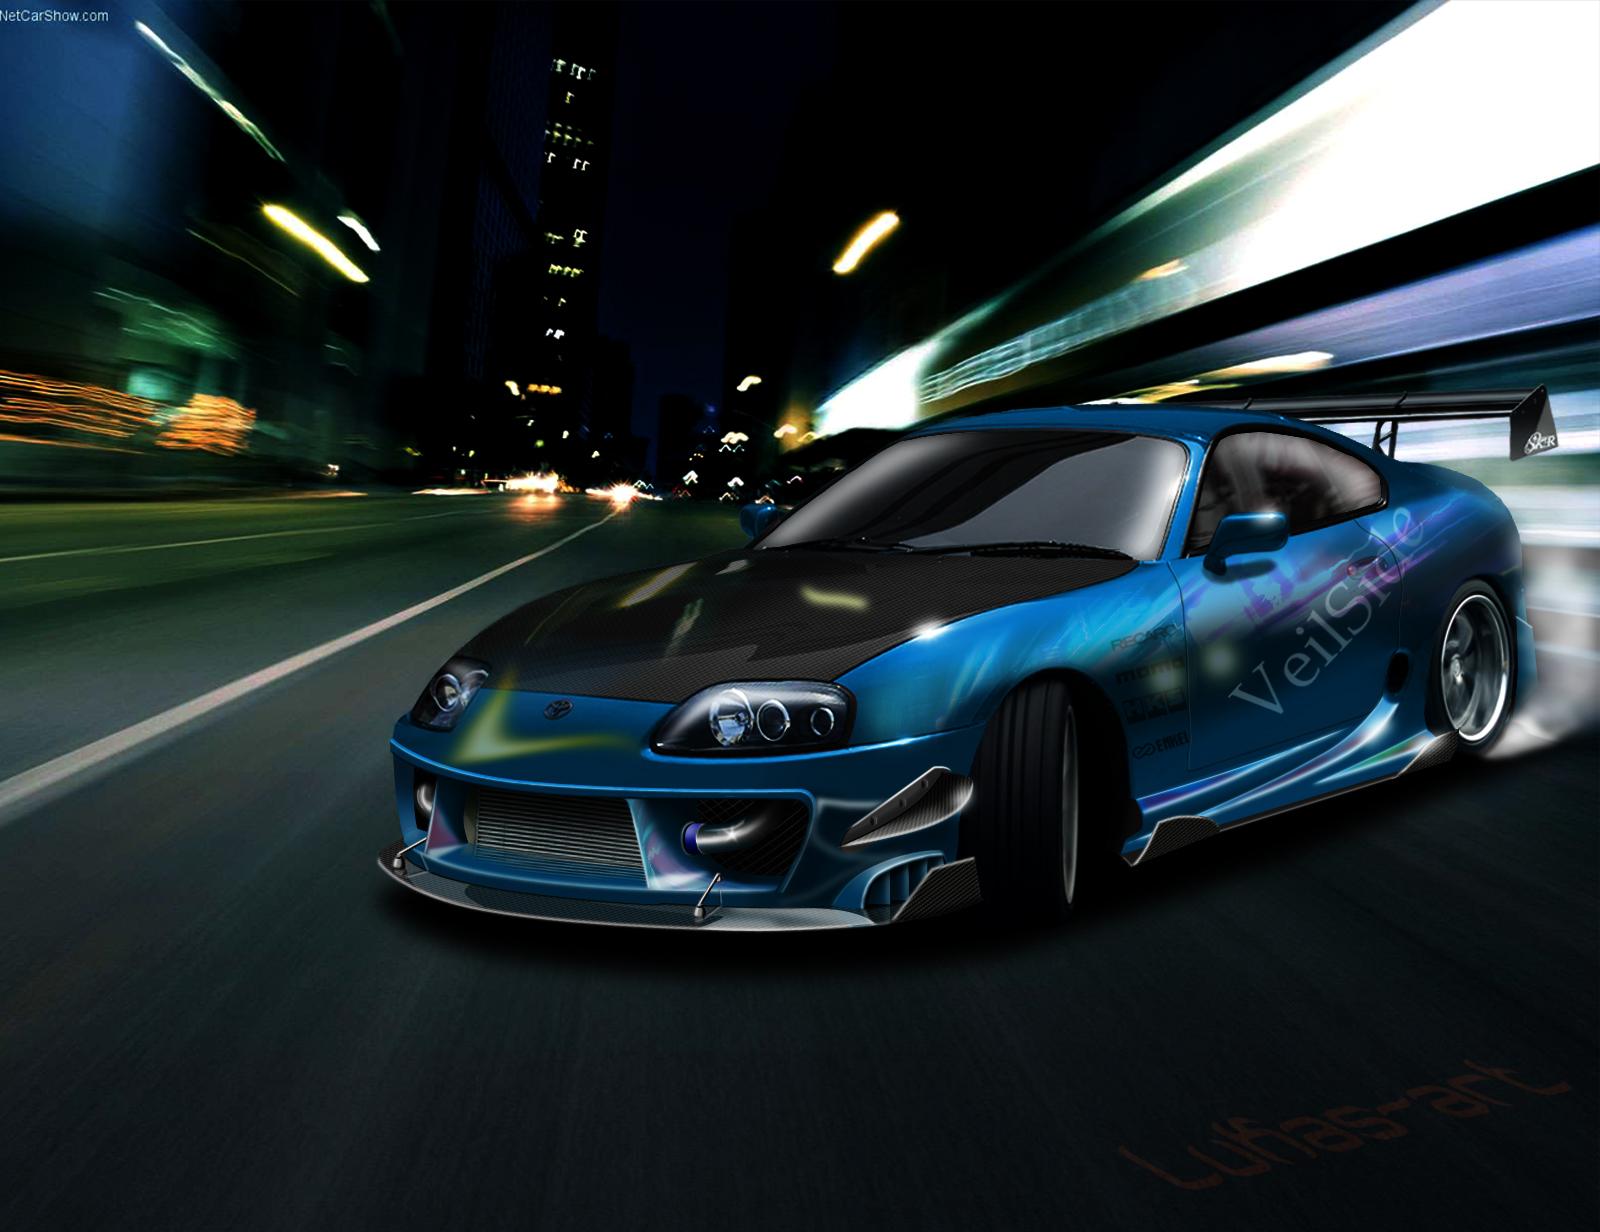 toyota supra wallpaper Its My Car Club 1600x1232